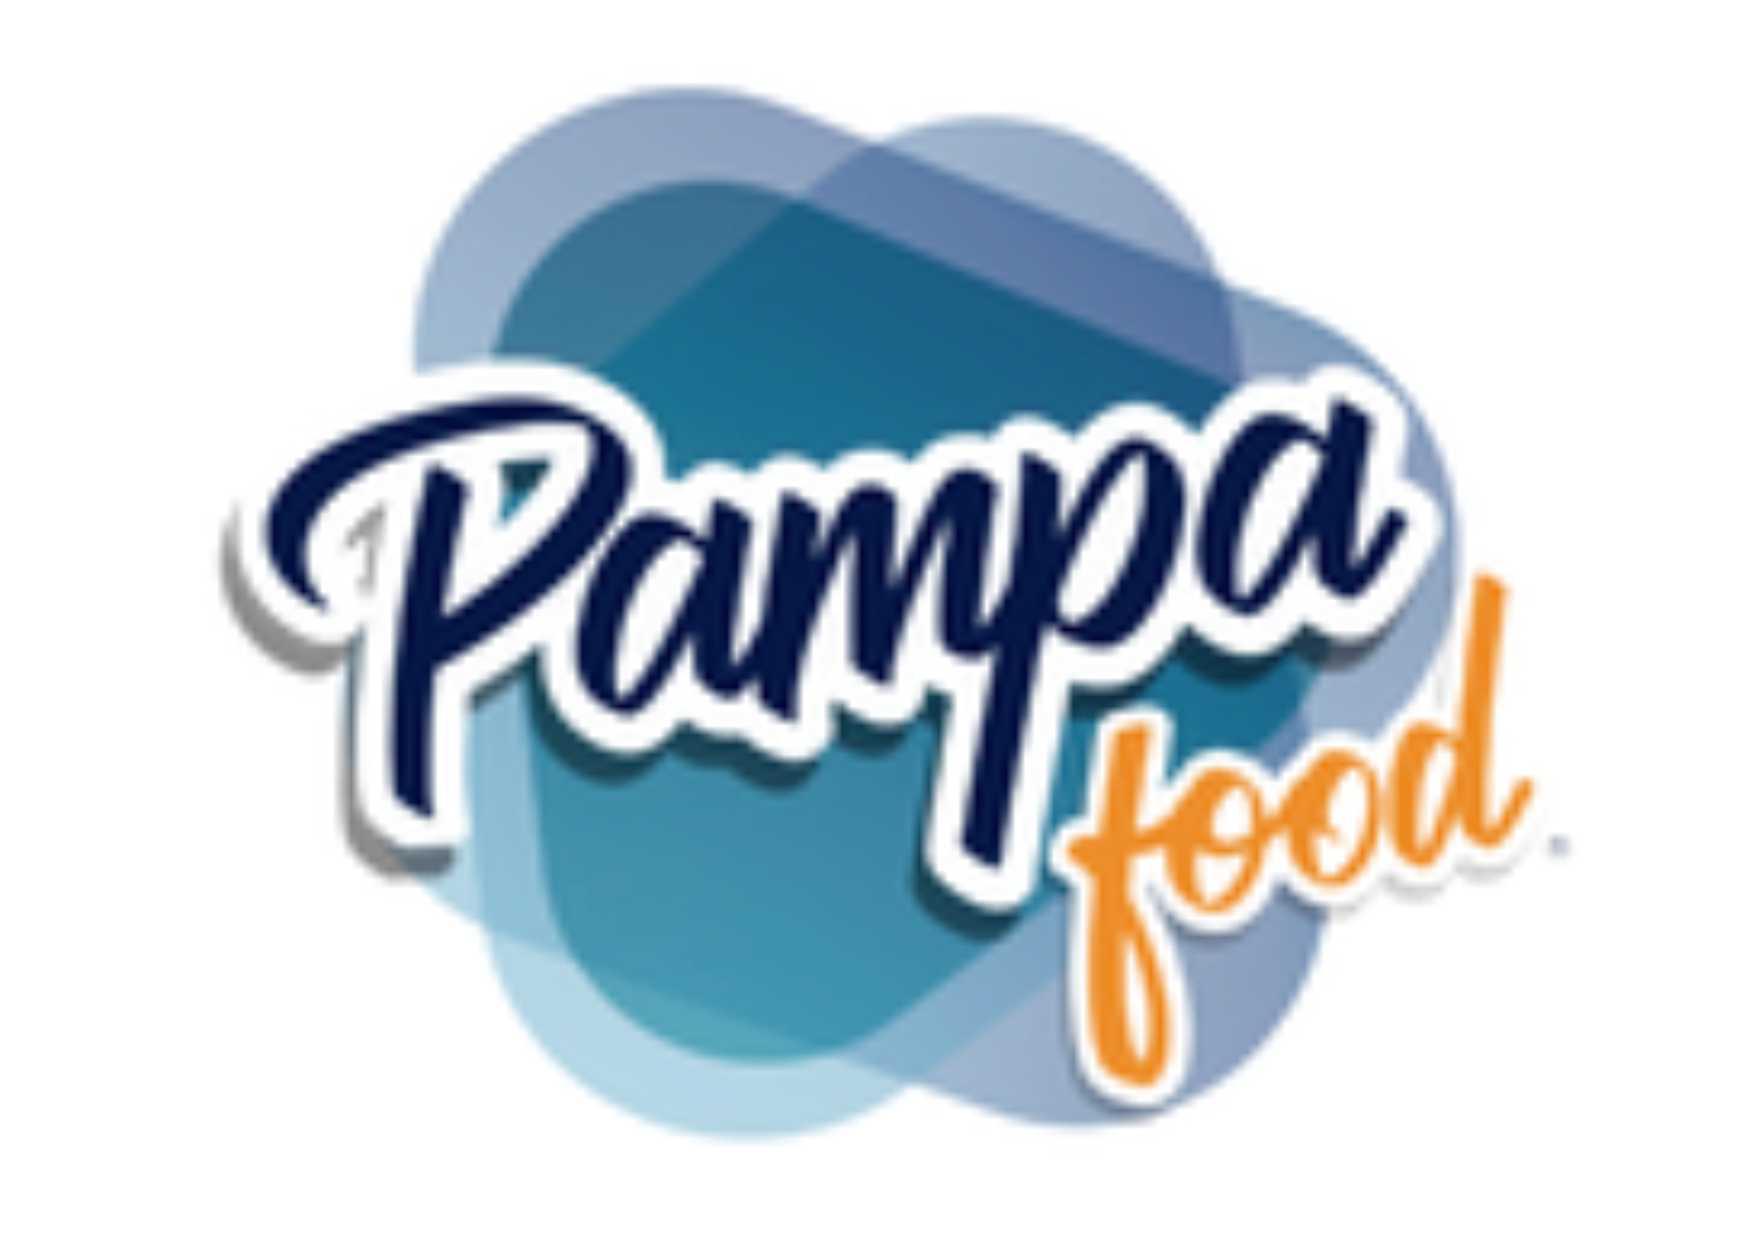 34- pampa food